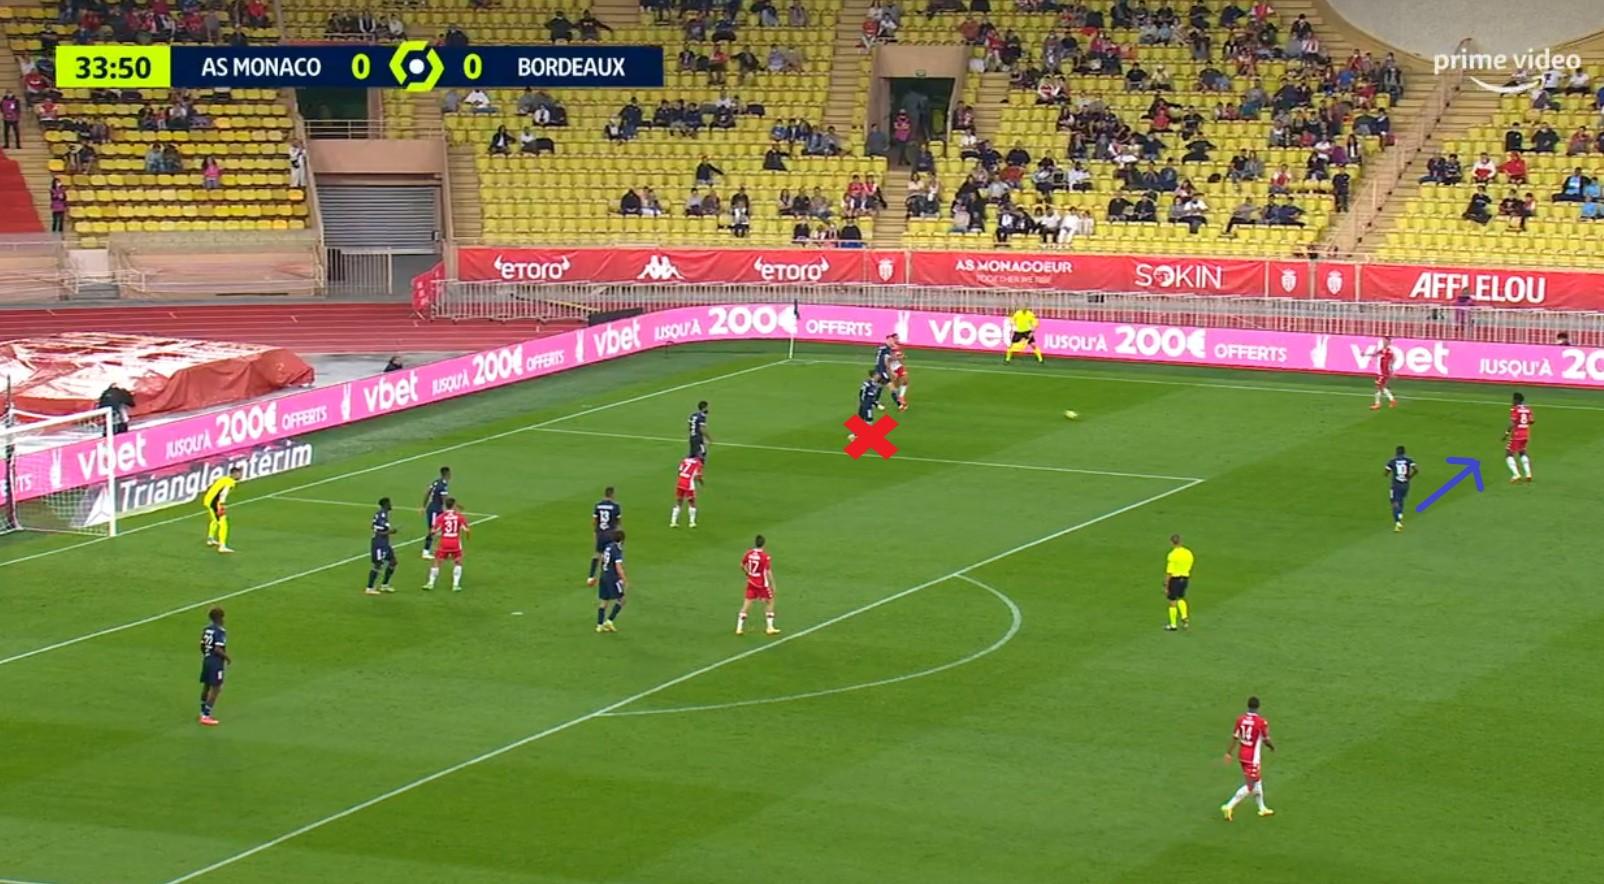 Monaco2_8.jpg (330 KB)